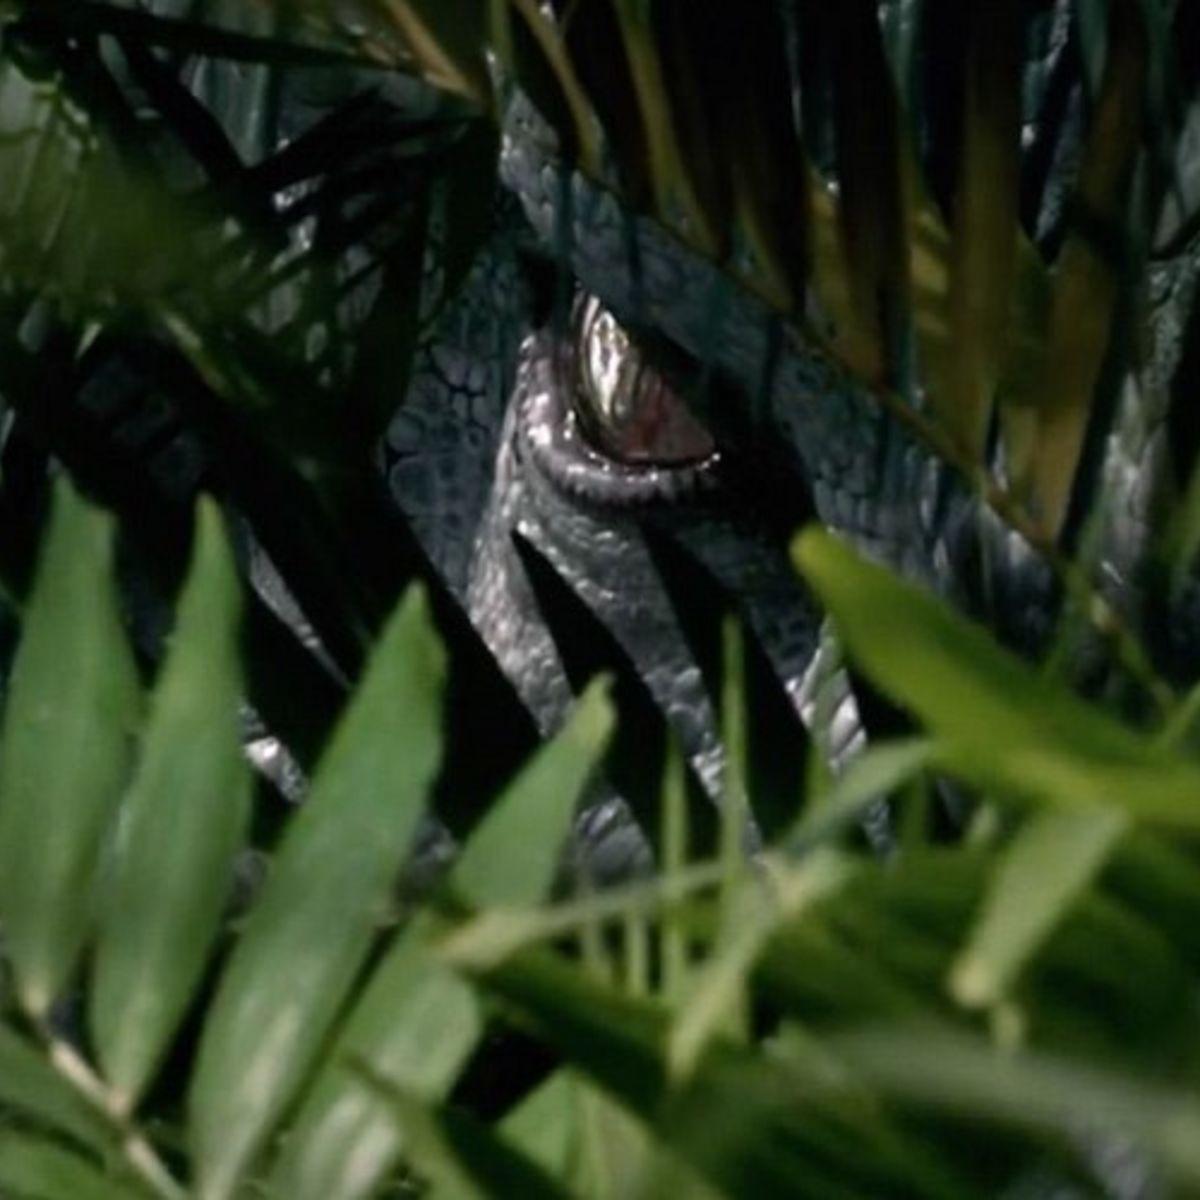 Jurassic-World-Indominus-Rex-Dinosaur.jpg